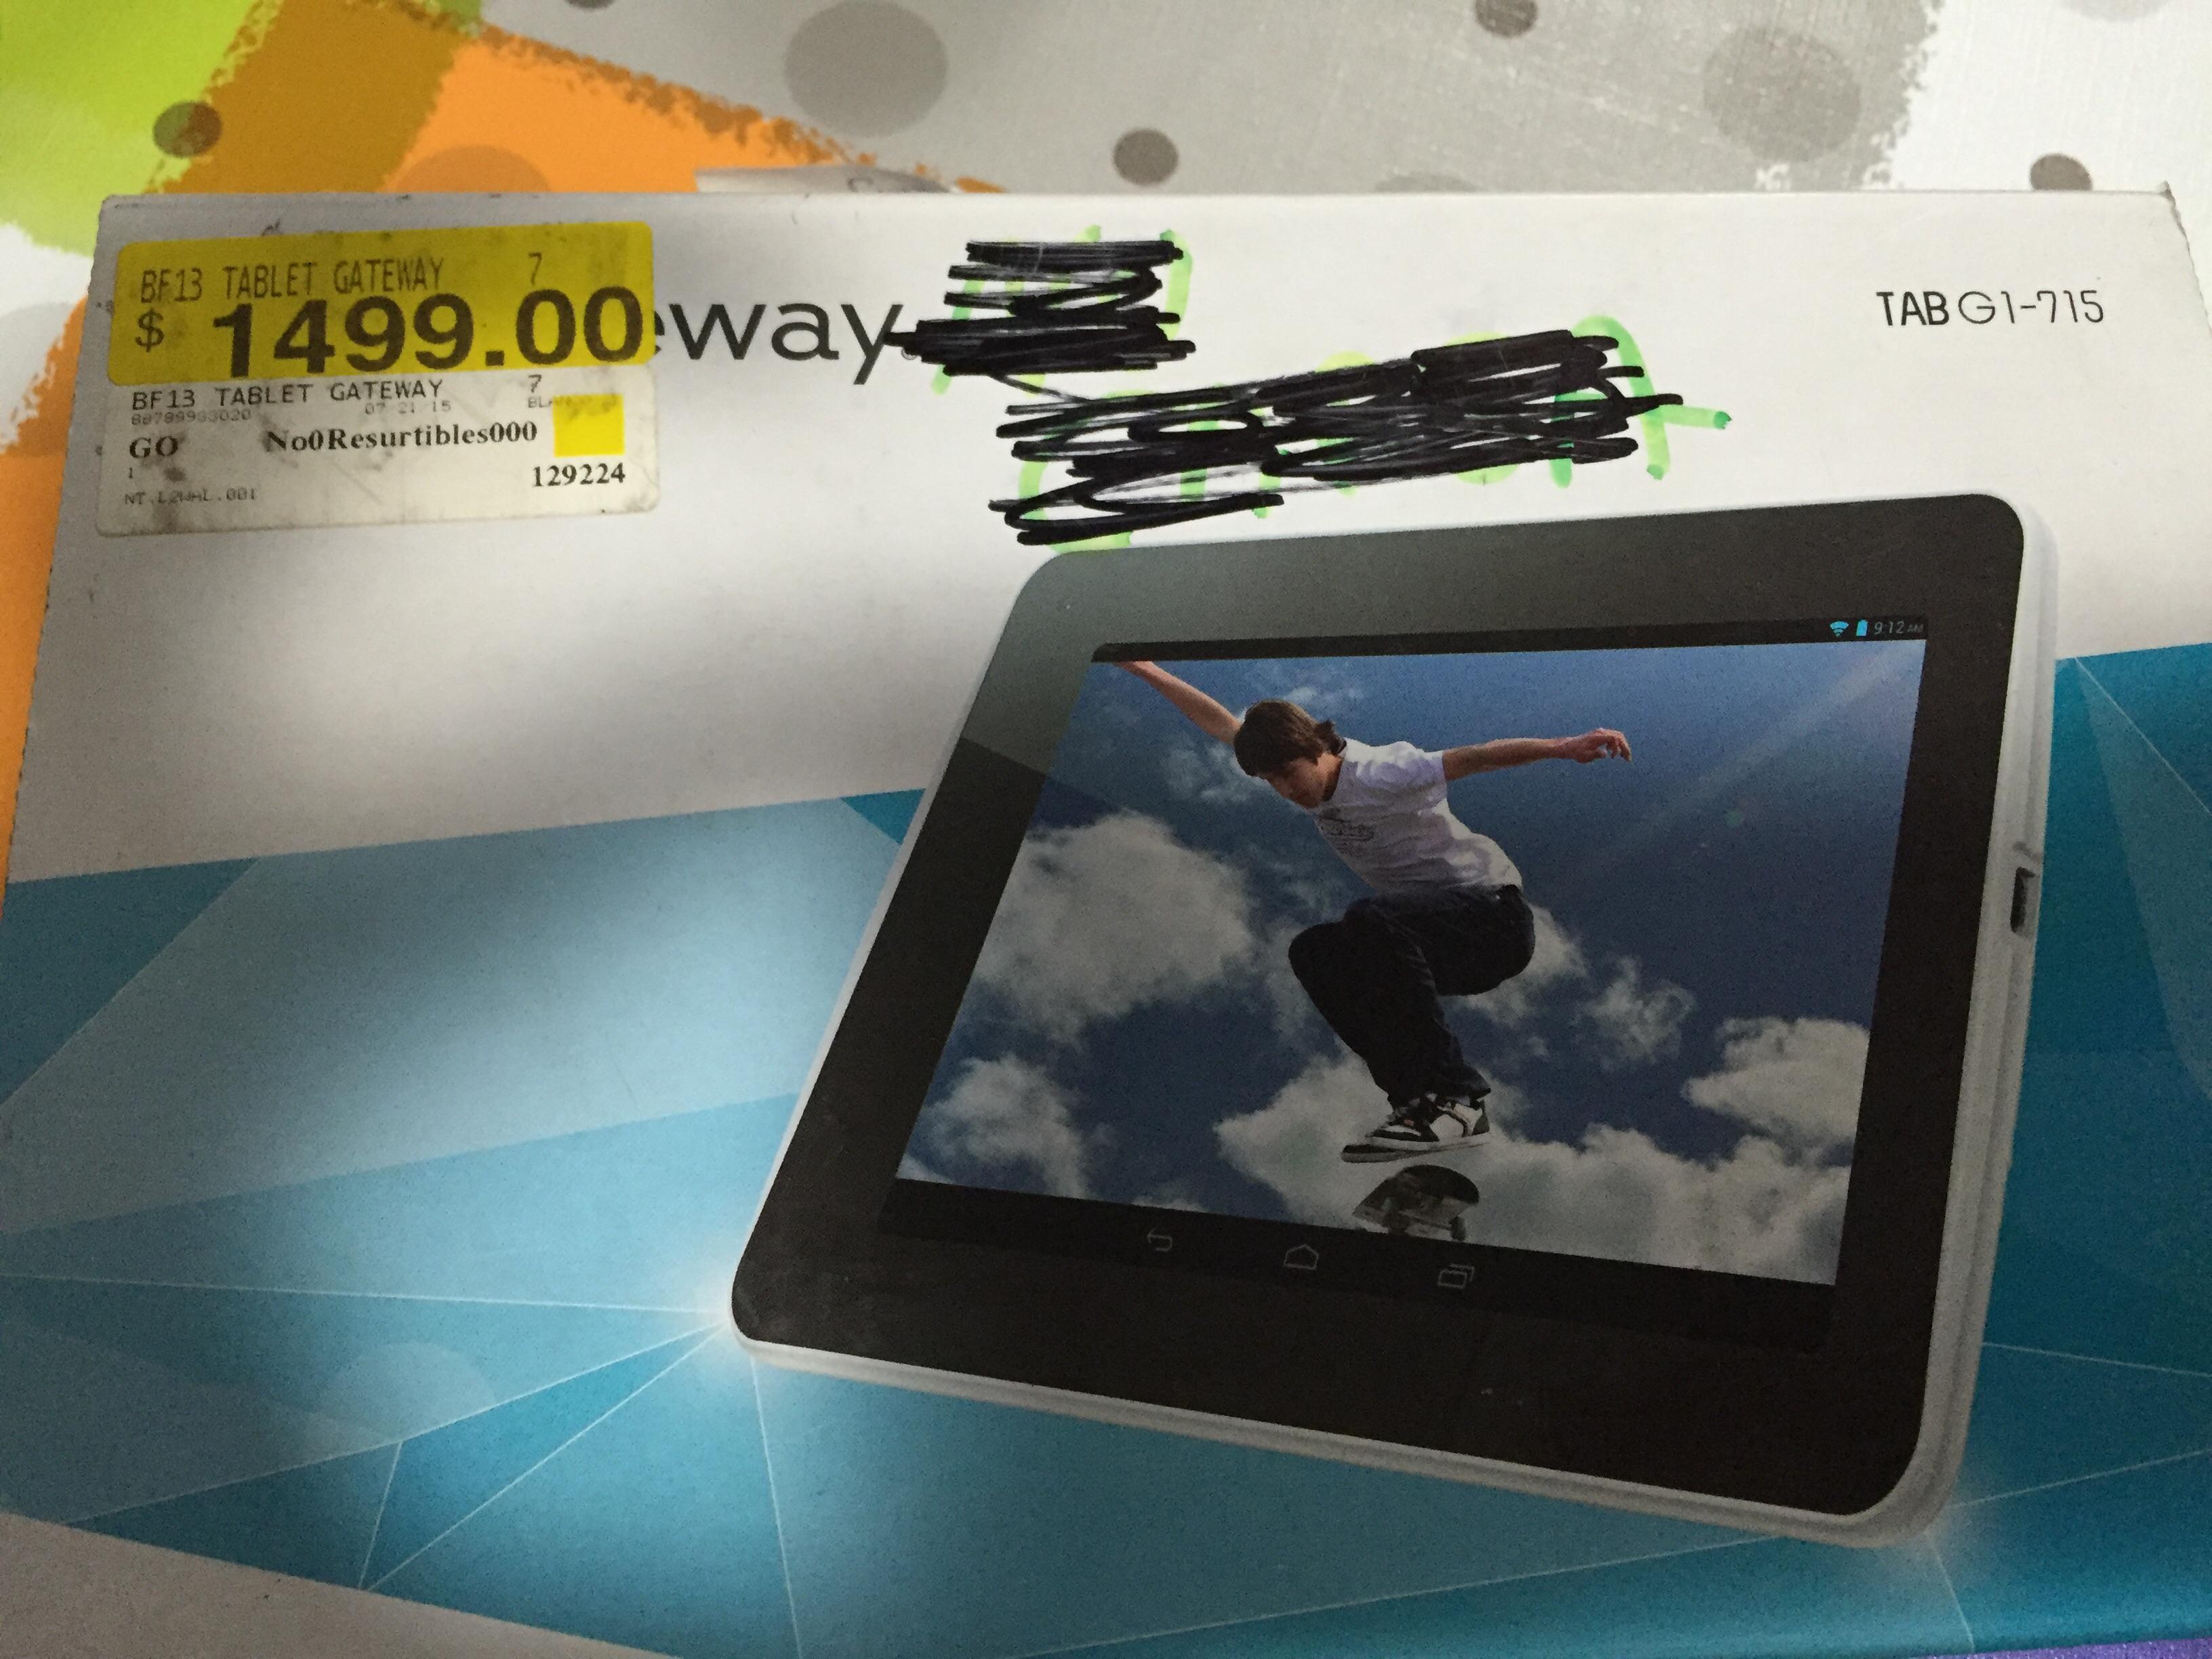 Walmart Cuajimalpa: Tablet Gateway G1-715 a $649.01